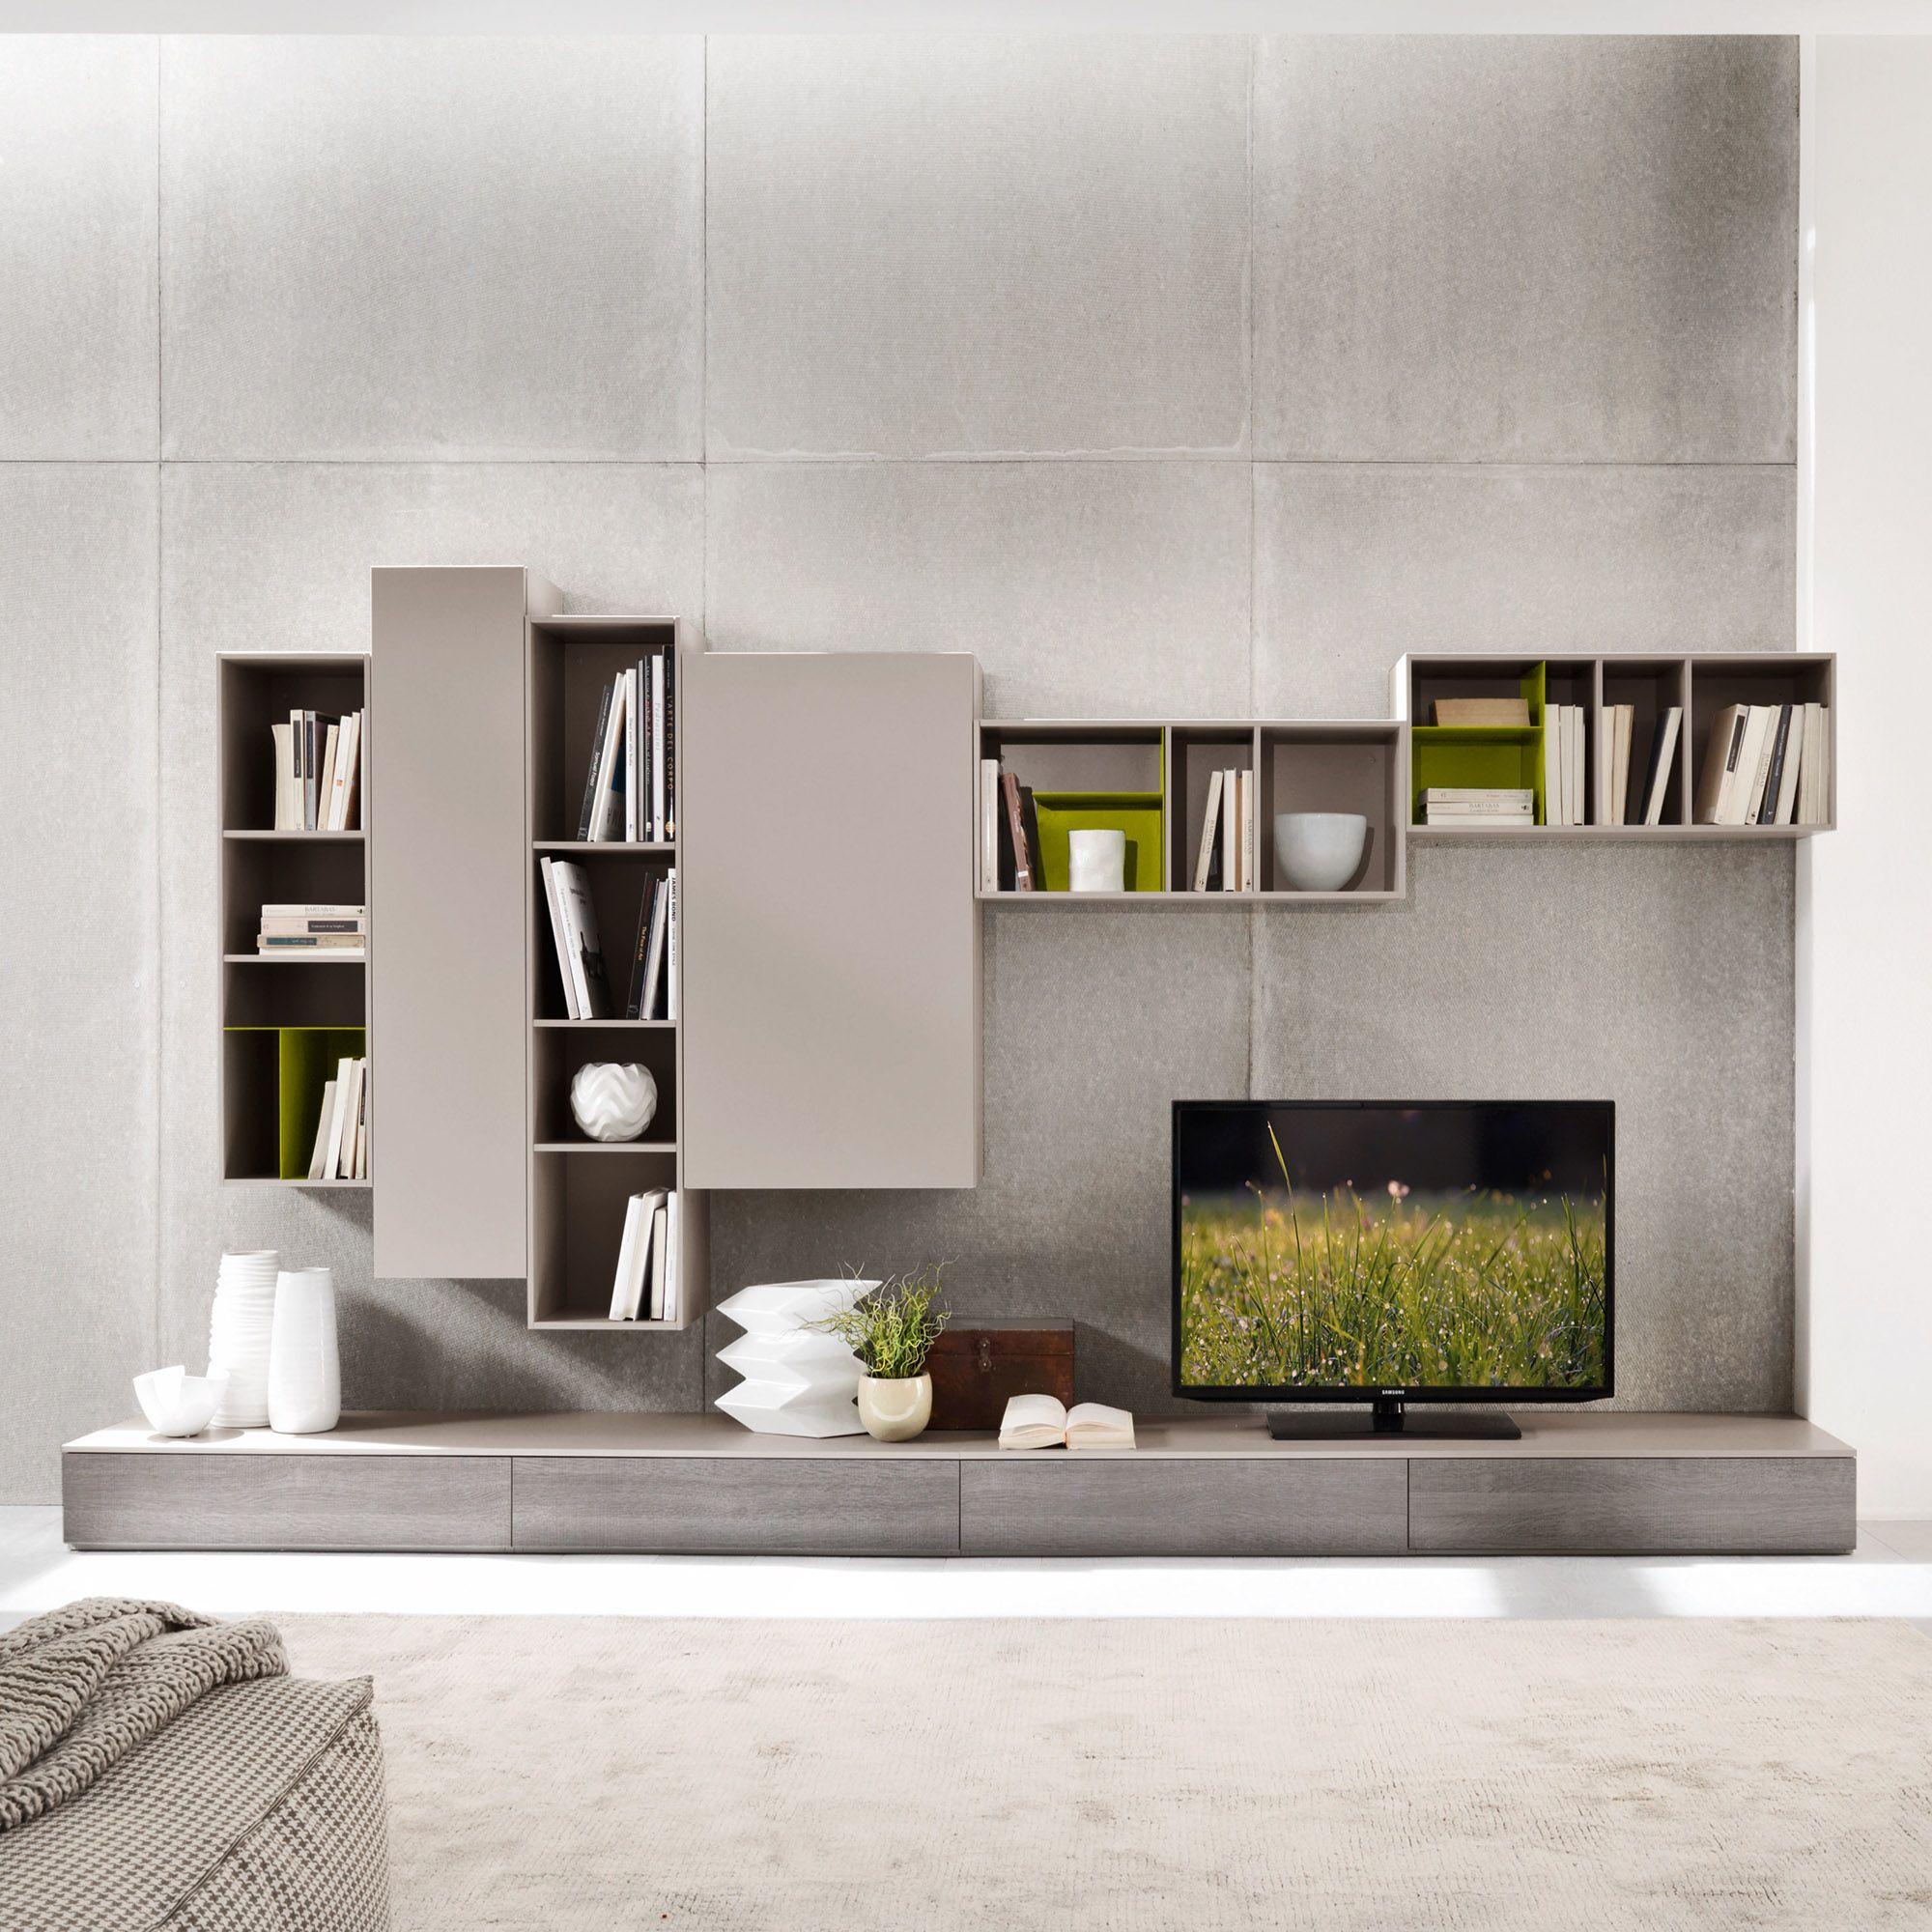 Tv Unit Modern Contemporary Designsiluetto 360 Cm Length At Inspiration Design For Wall Unit In Living Room Design Decoration